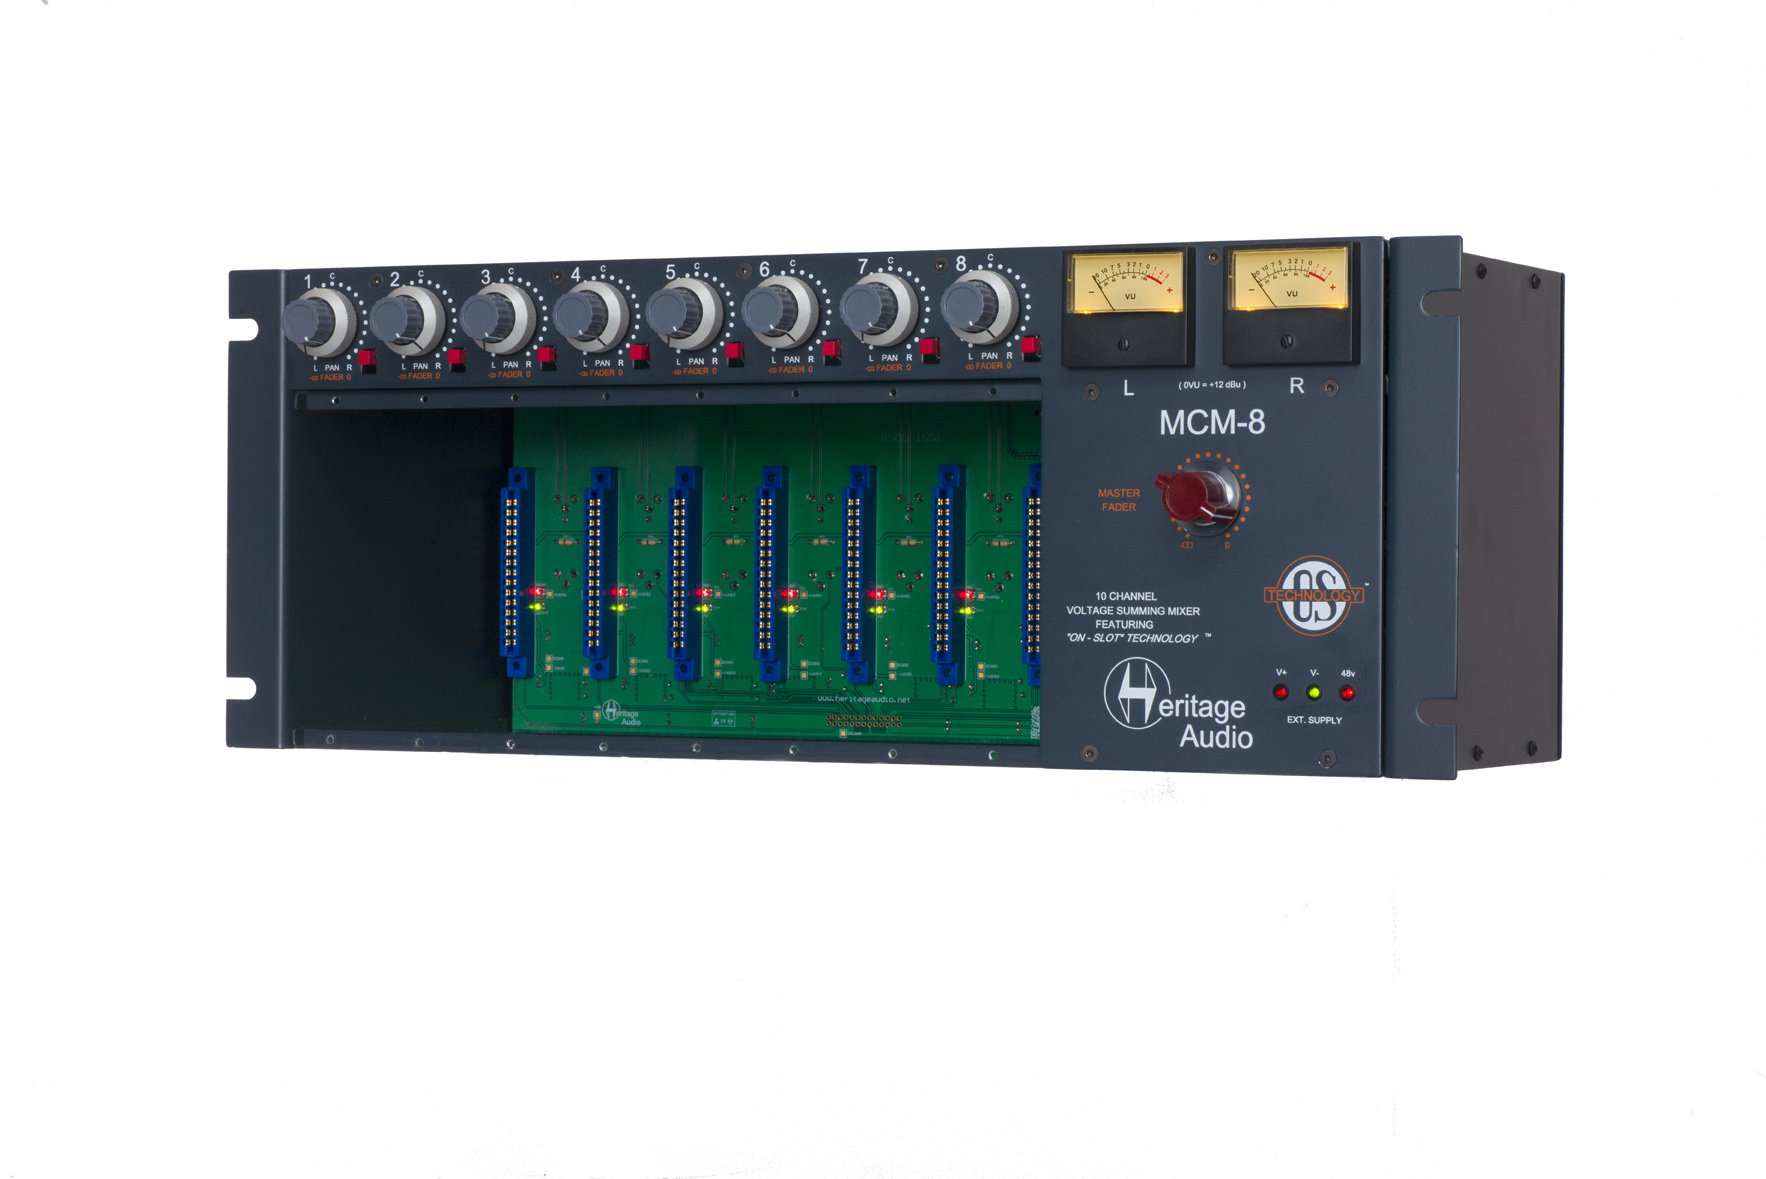 Heritage Audio MCM-8 8 Slot Rack